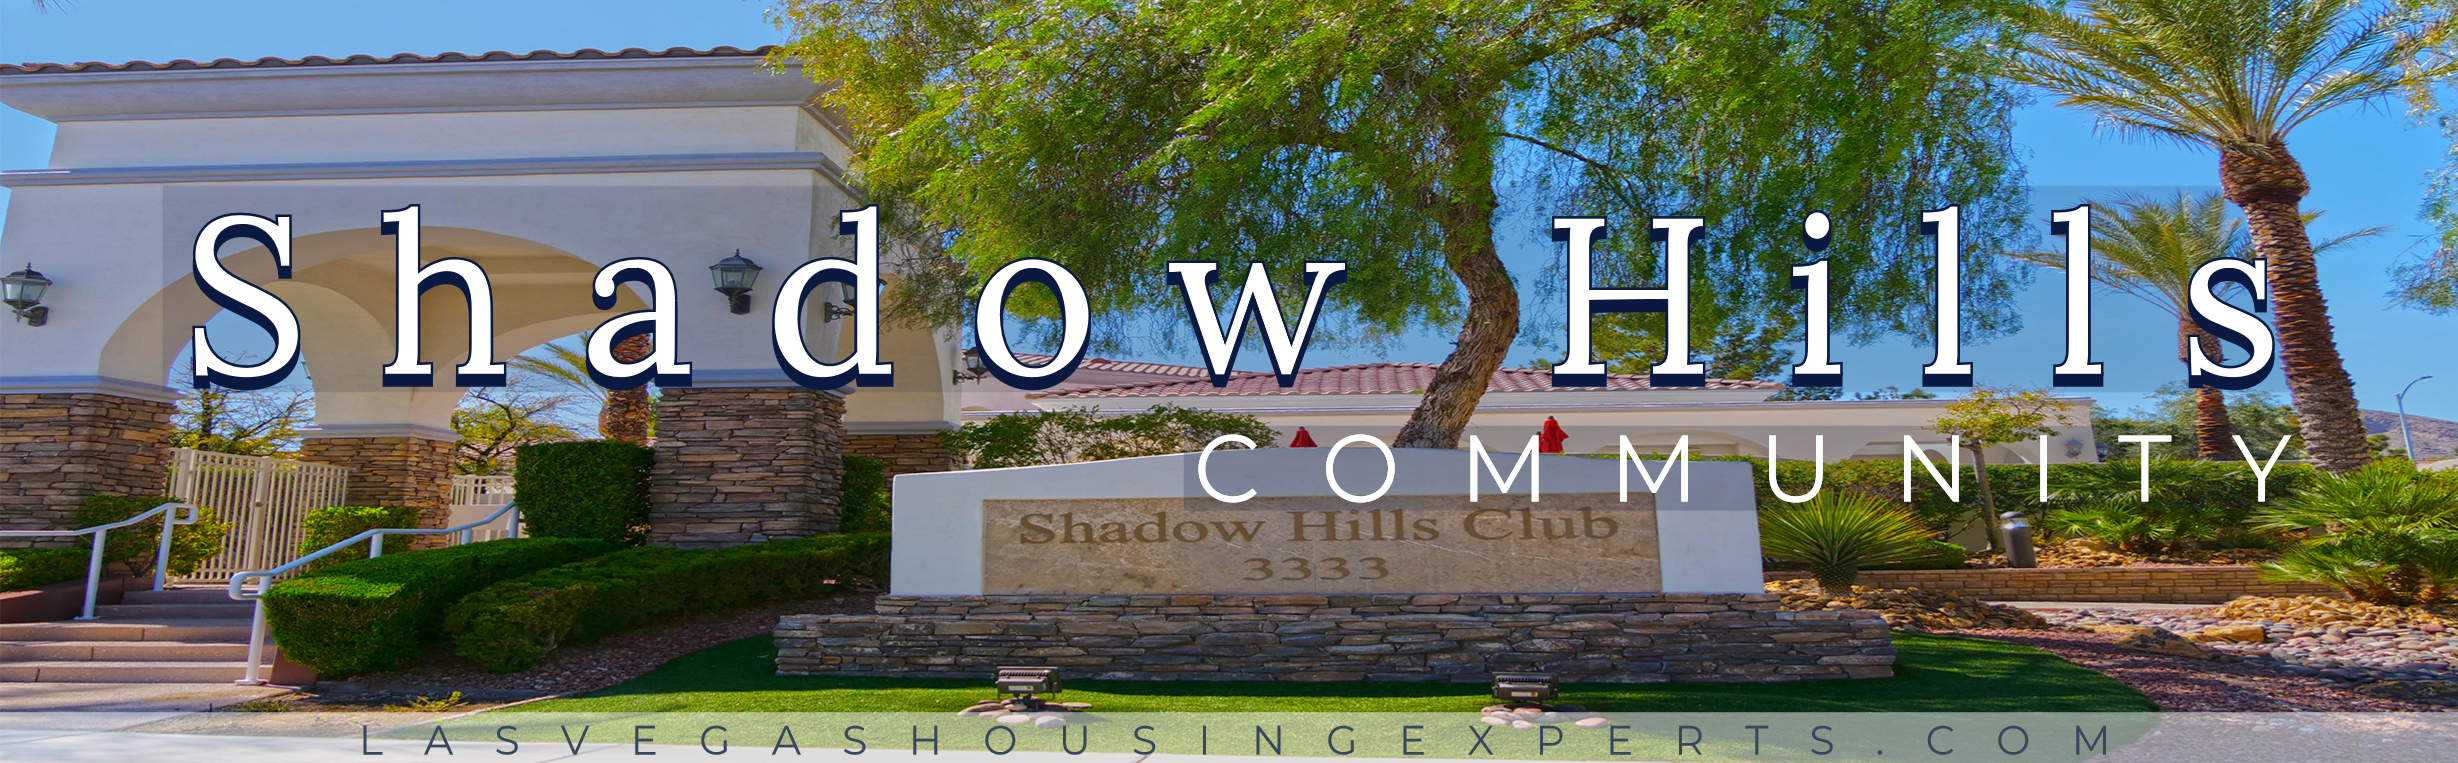 Shadow Hills Las Vegas Housing Experts real estate